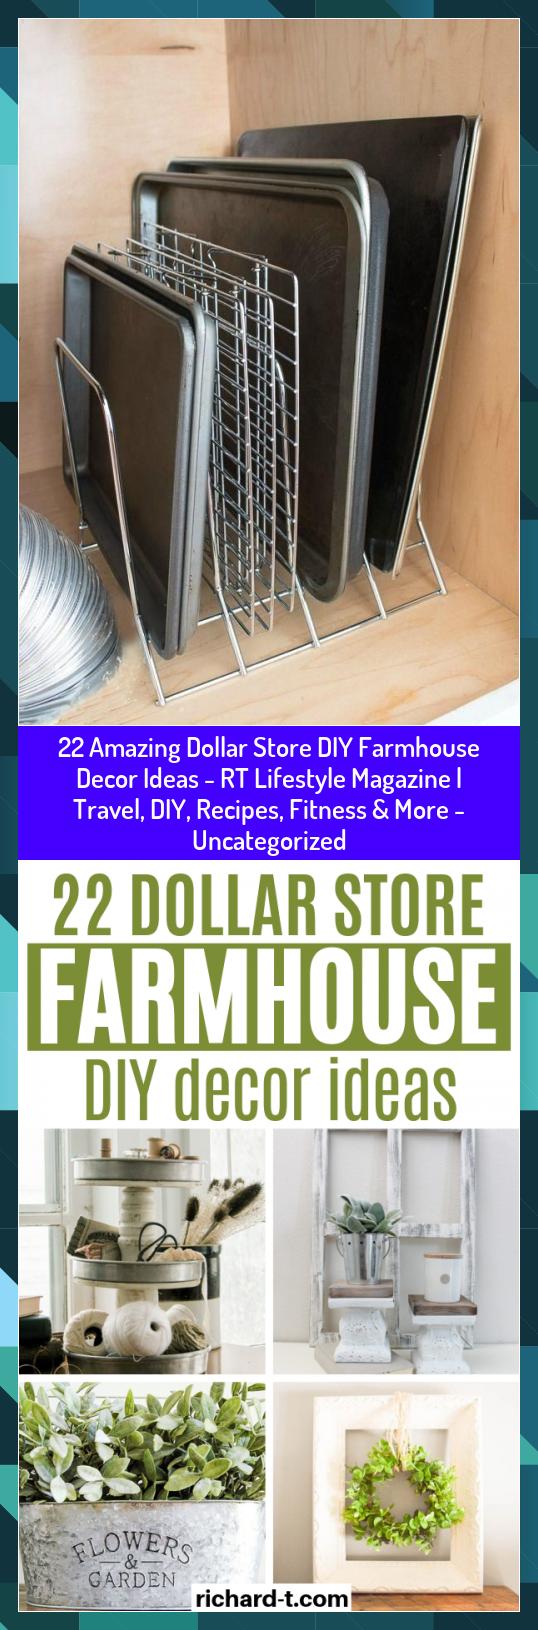 22 Amazing Dollar Store DIY Farmhouse Decor Ideas - RT Lifestyle Magazine | Travel, DIY, Recipes, Fi...